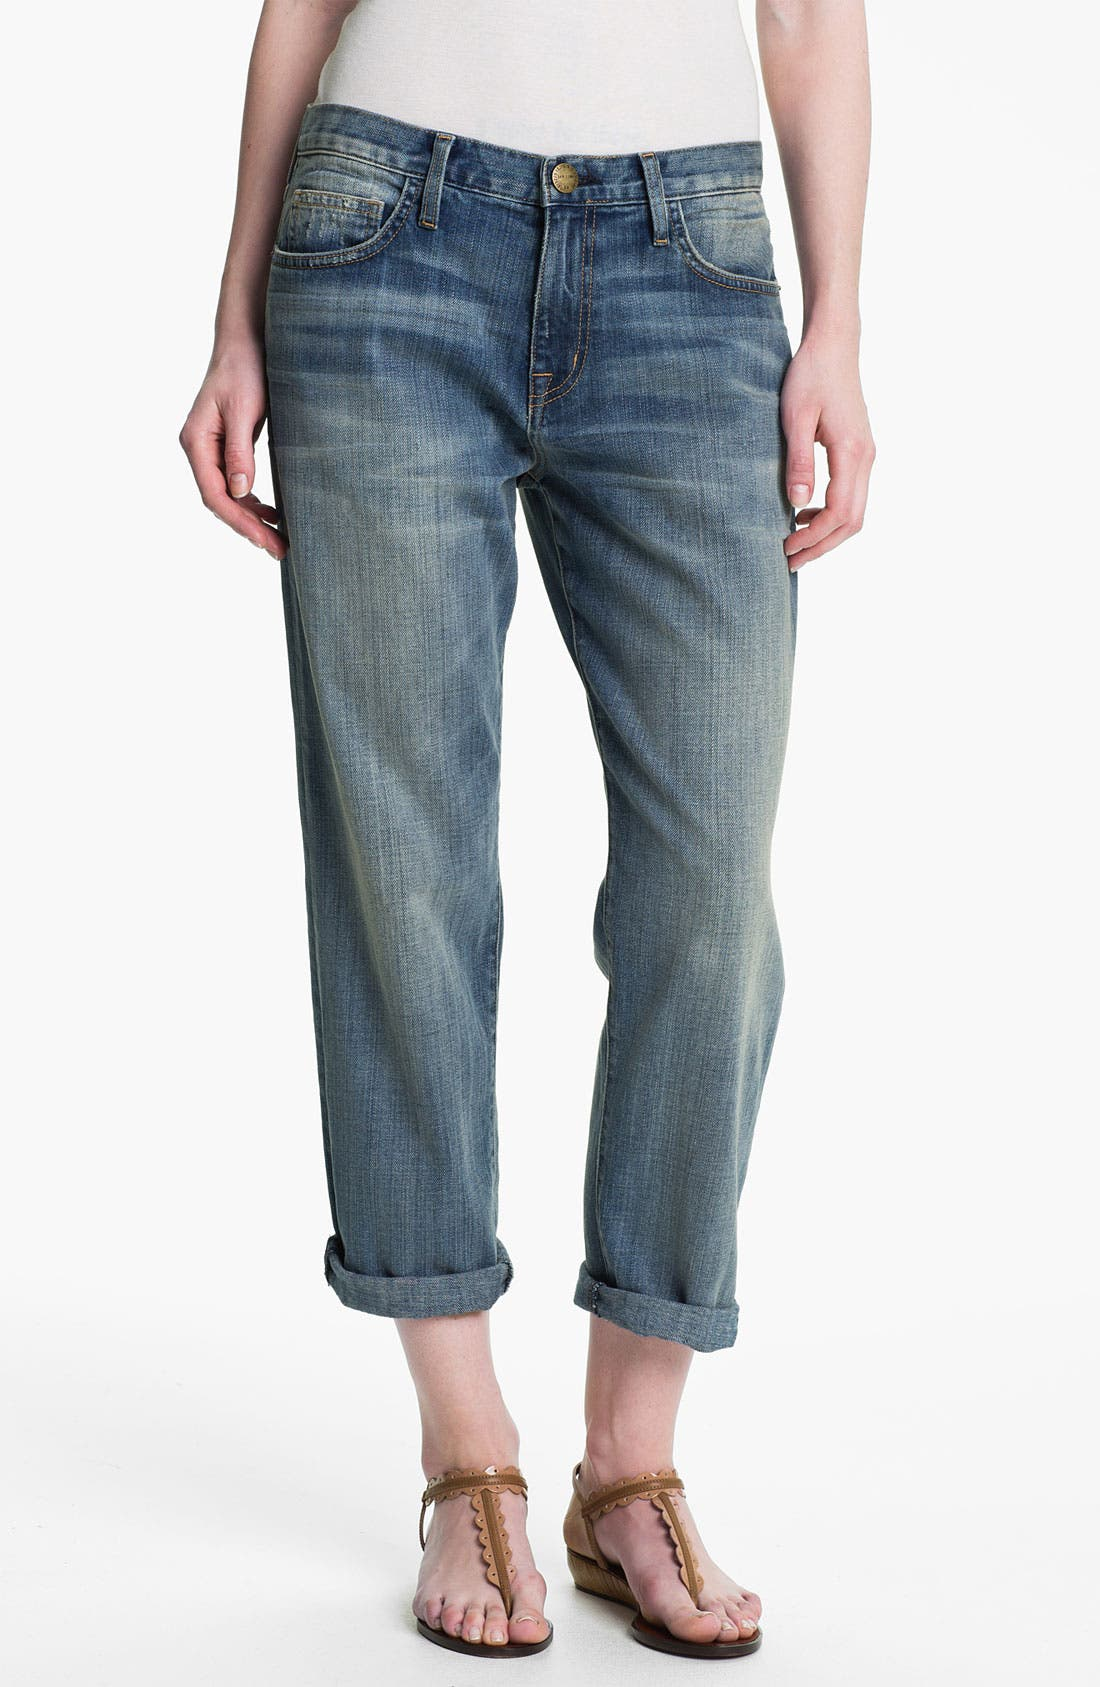 Alternate Image 1 Selected - Current/Elliott 'The Boyfriend Jean' Stretch Jeans (Super Loved)